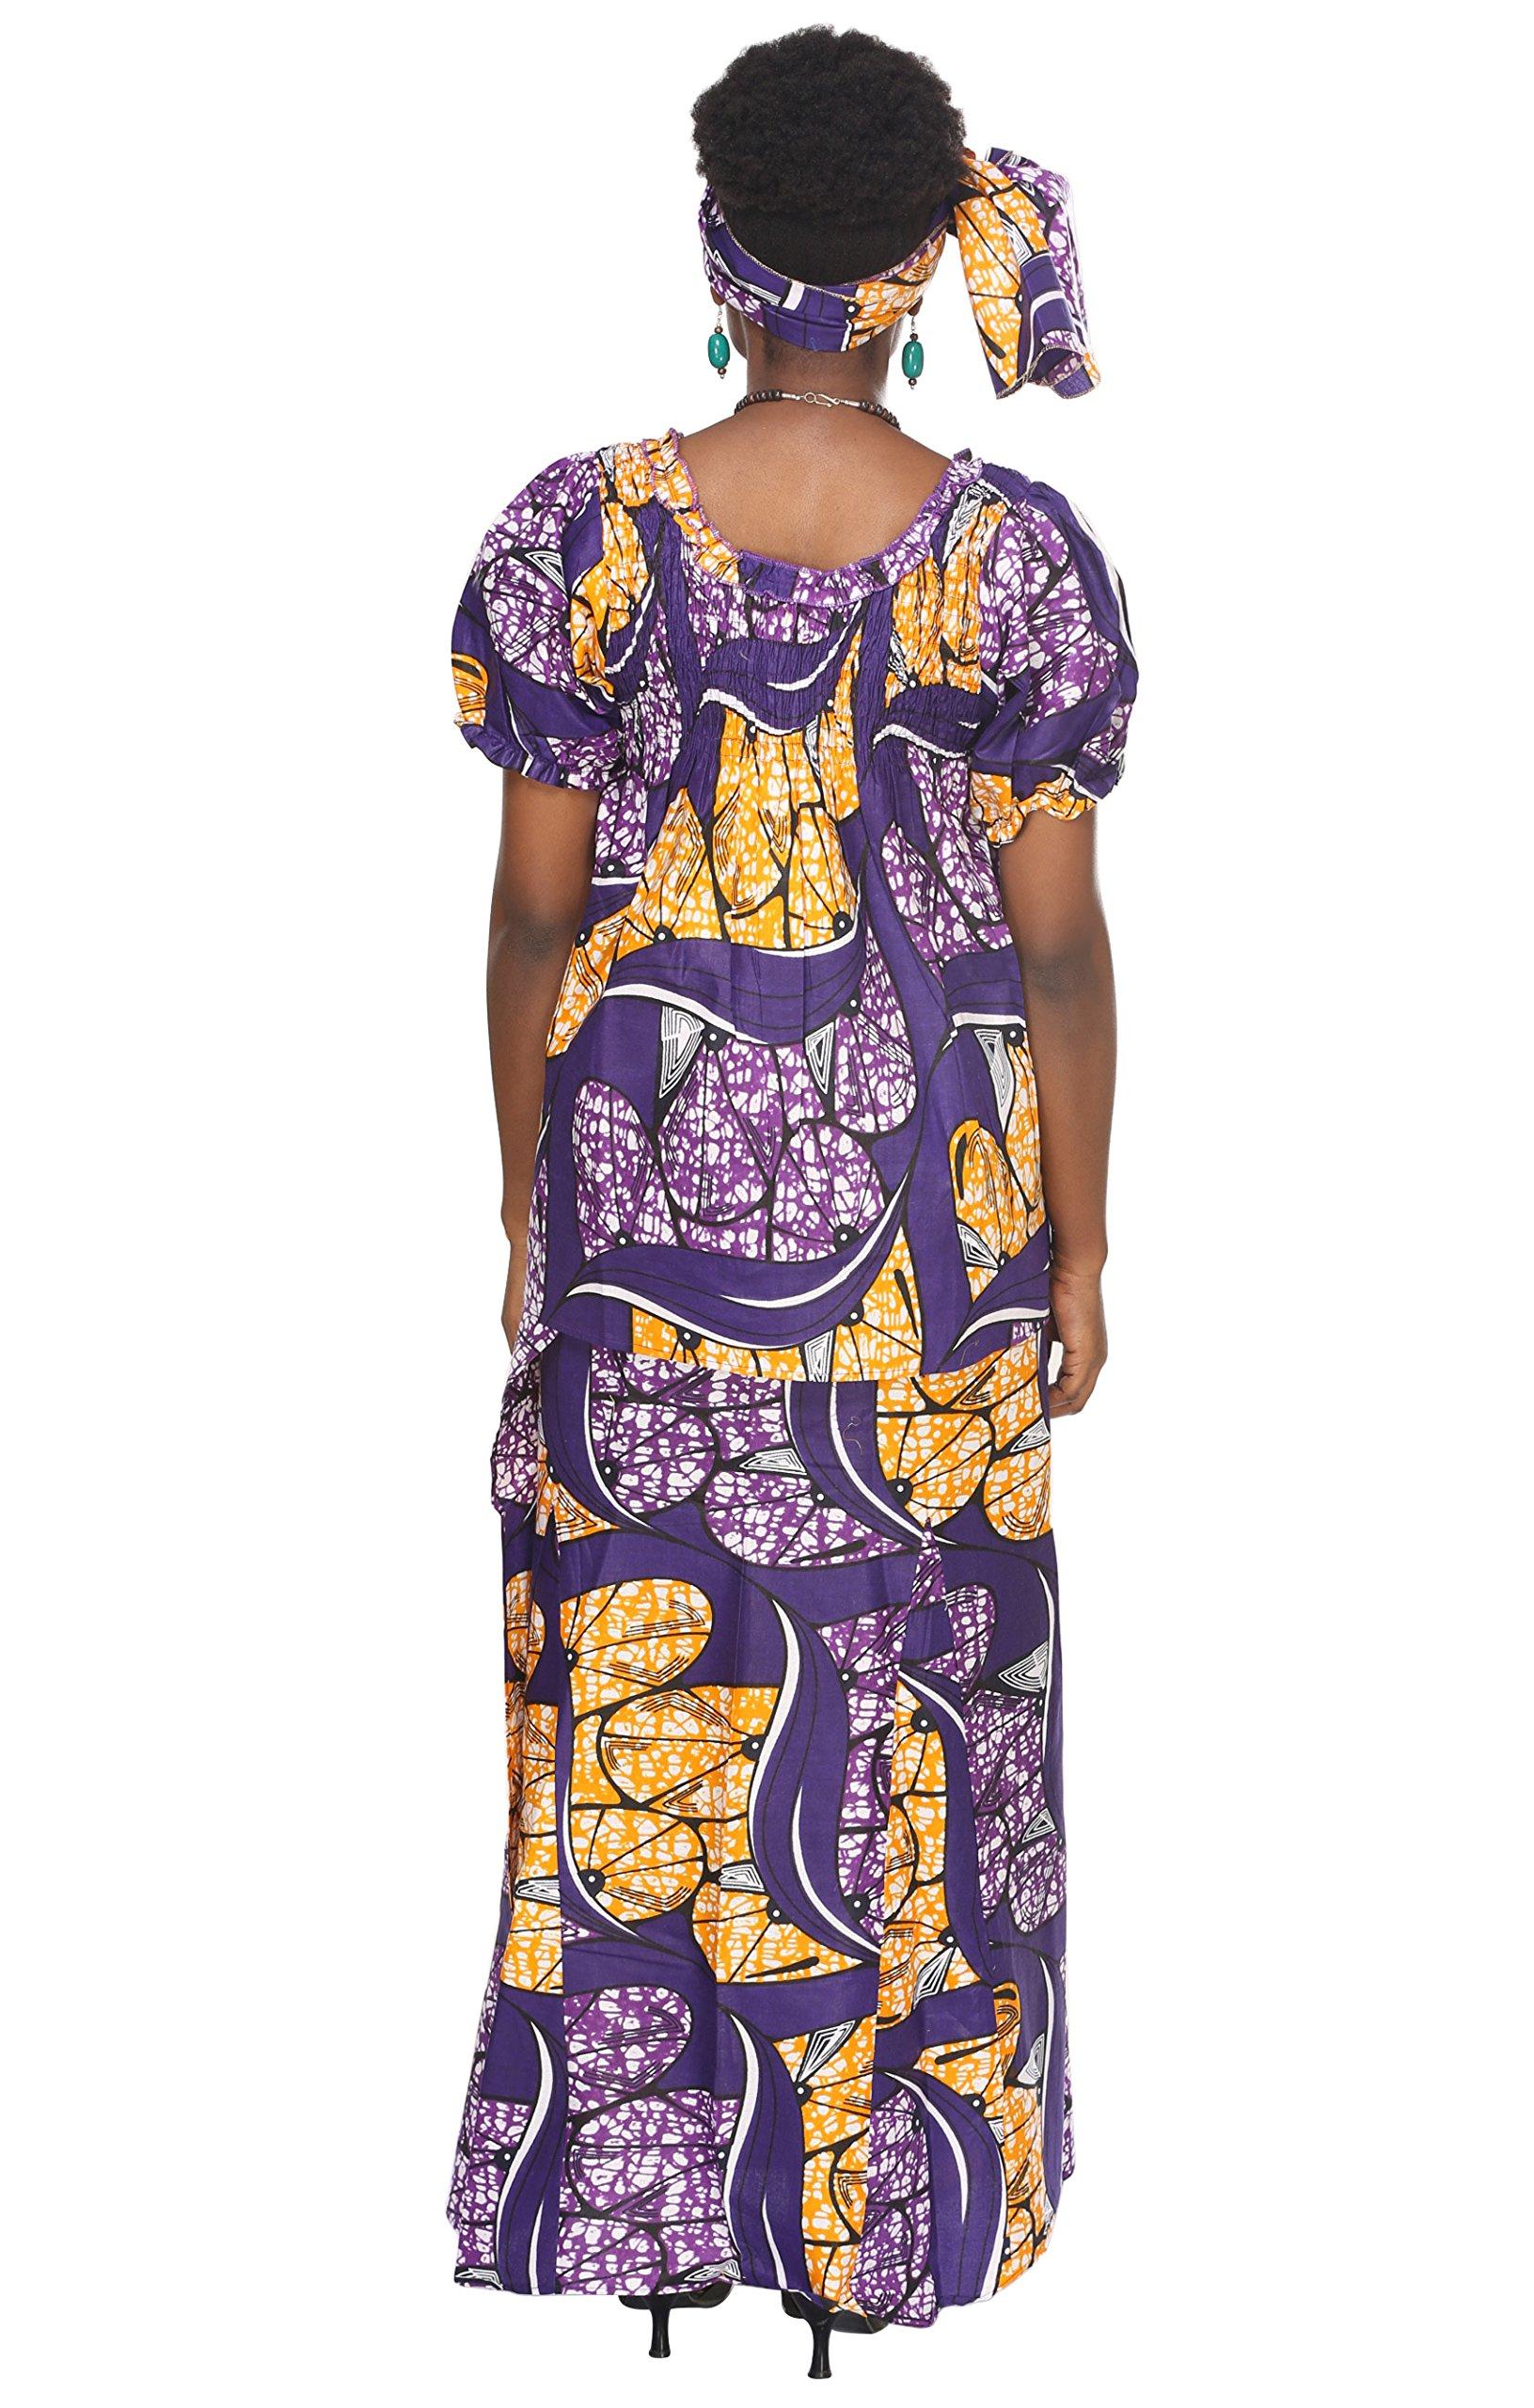 African Planet Women's Purple Wax 3 Piece Set Skirt Kenya Elastic Printed Waist Maxi by African Planet (Image #3)